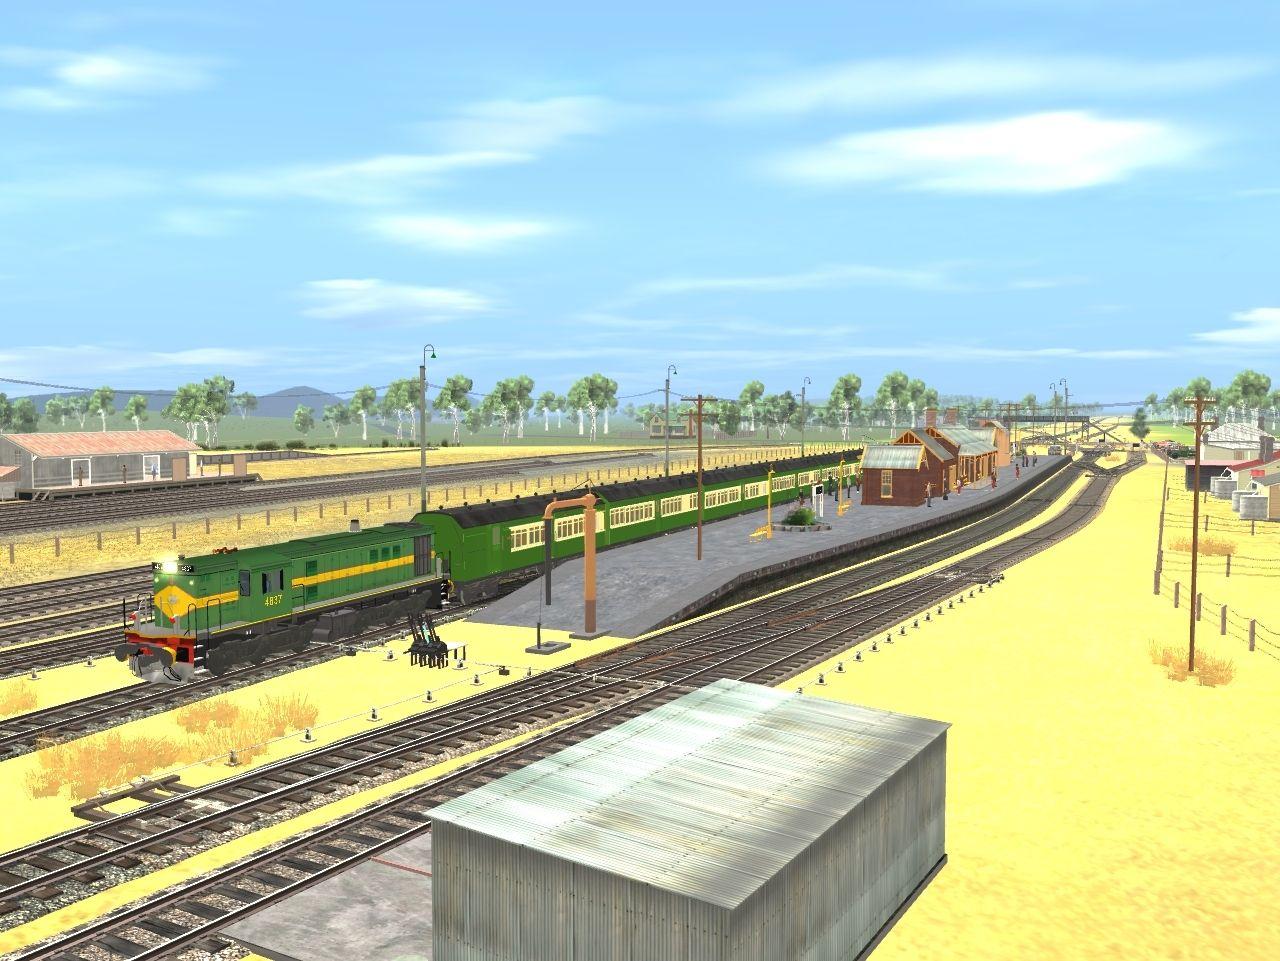 Trainz download station server full - buranrealtorn